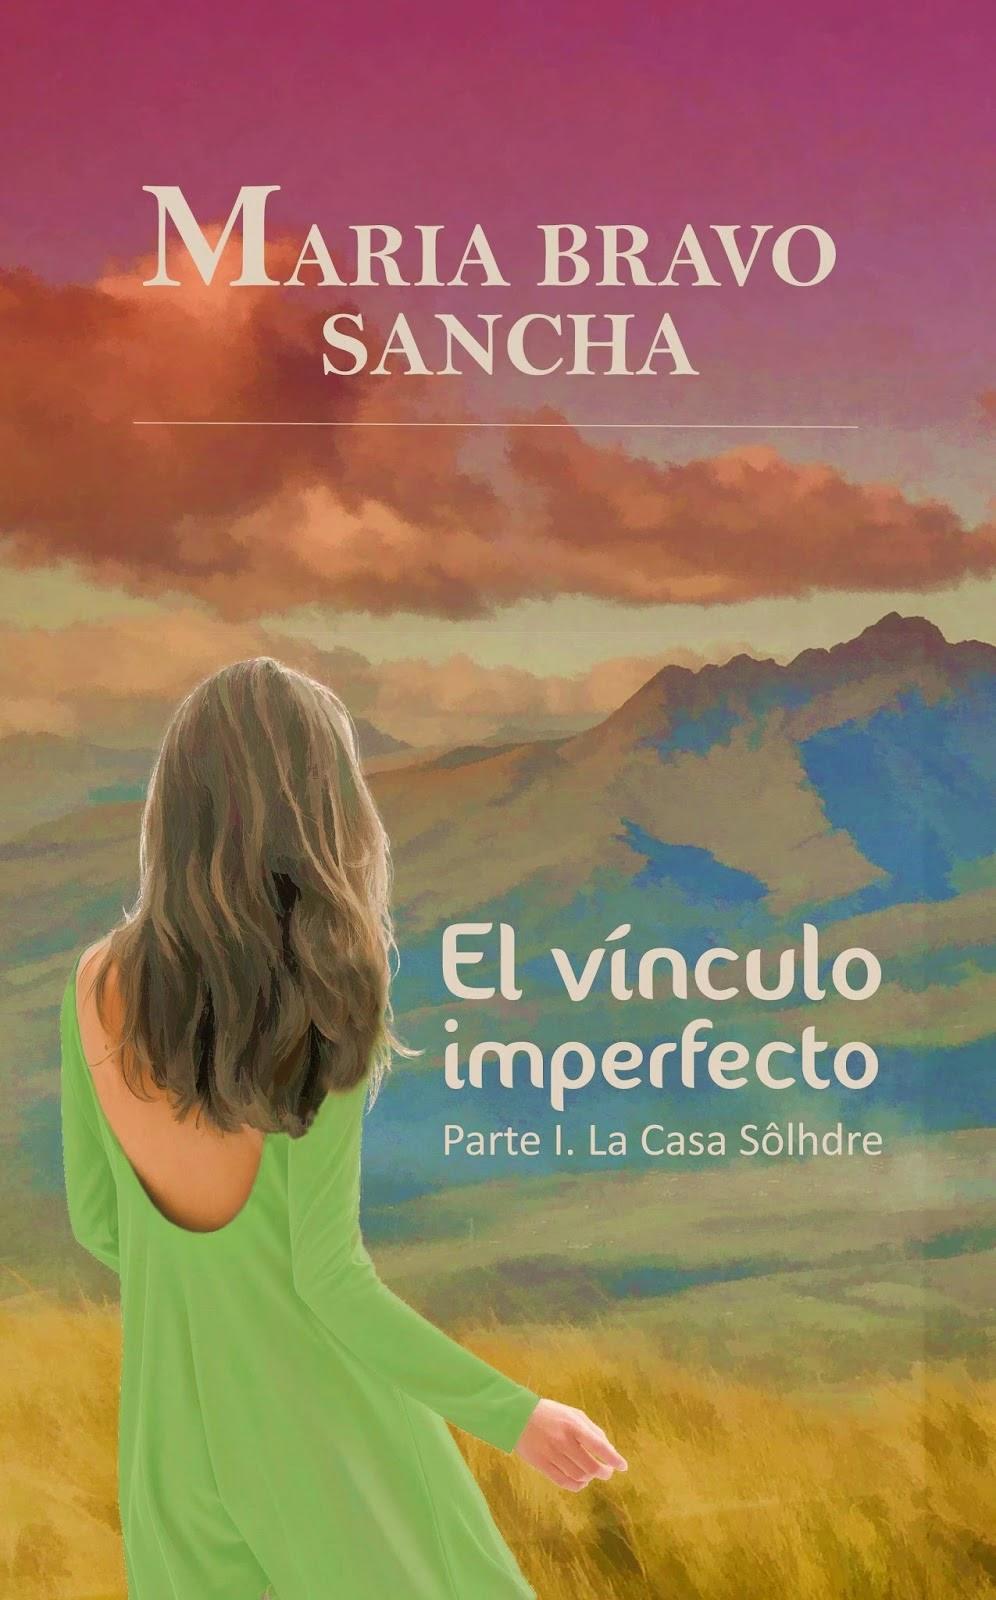 Mi novela en Amazon: